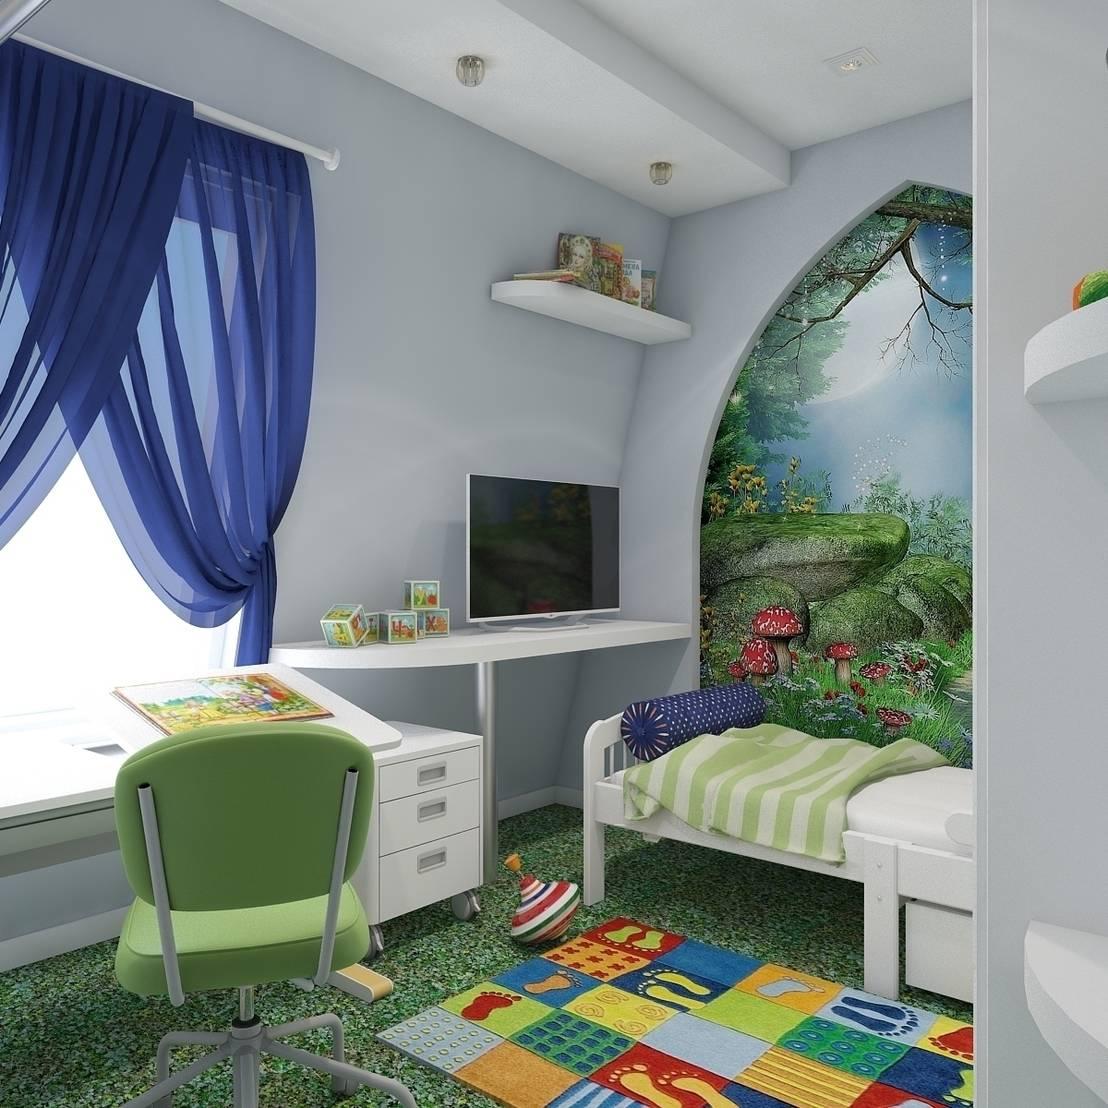 De asombroso dormitorios infantiles con estilo Para Empezar - Dormitorios infantiles al estilo asiático?!